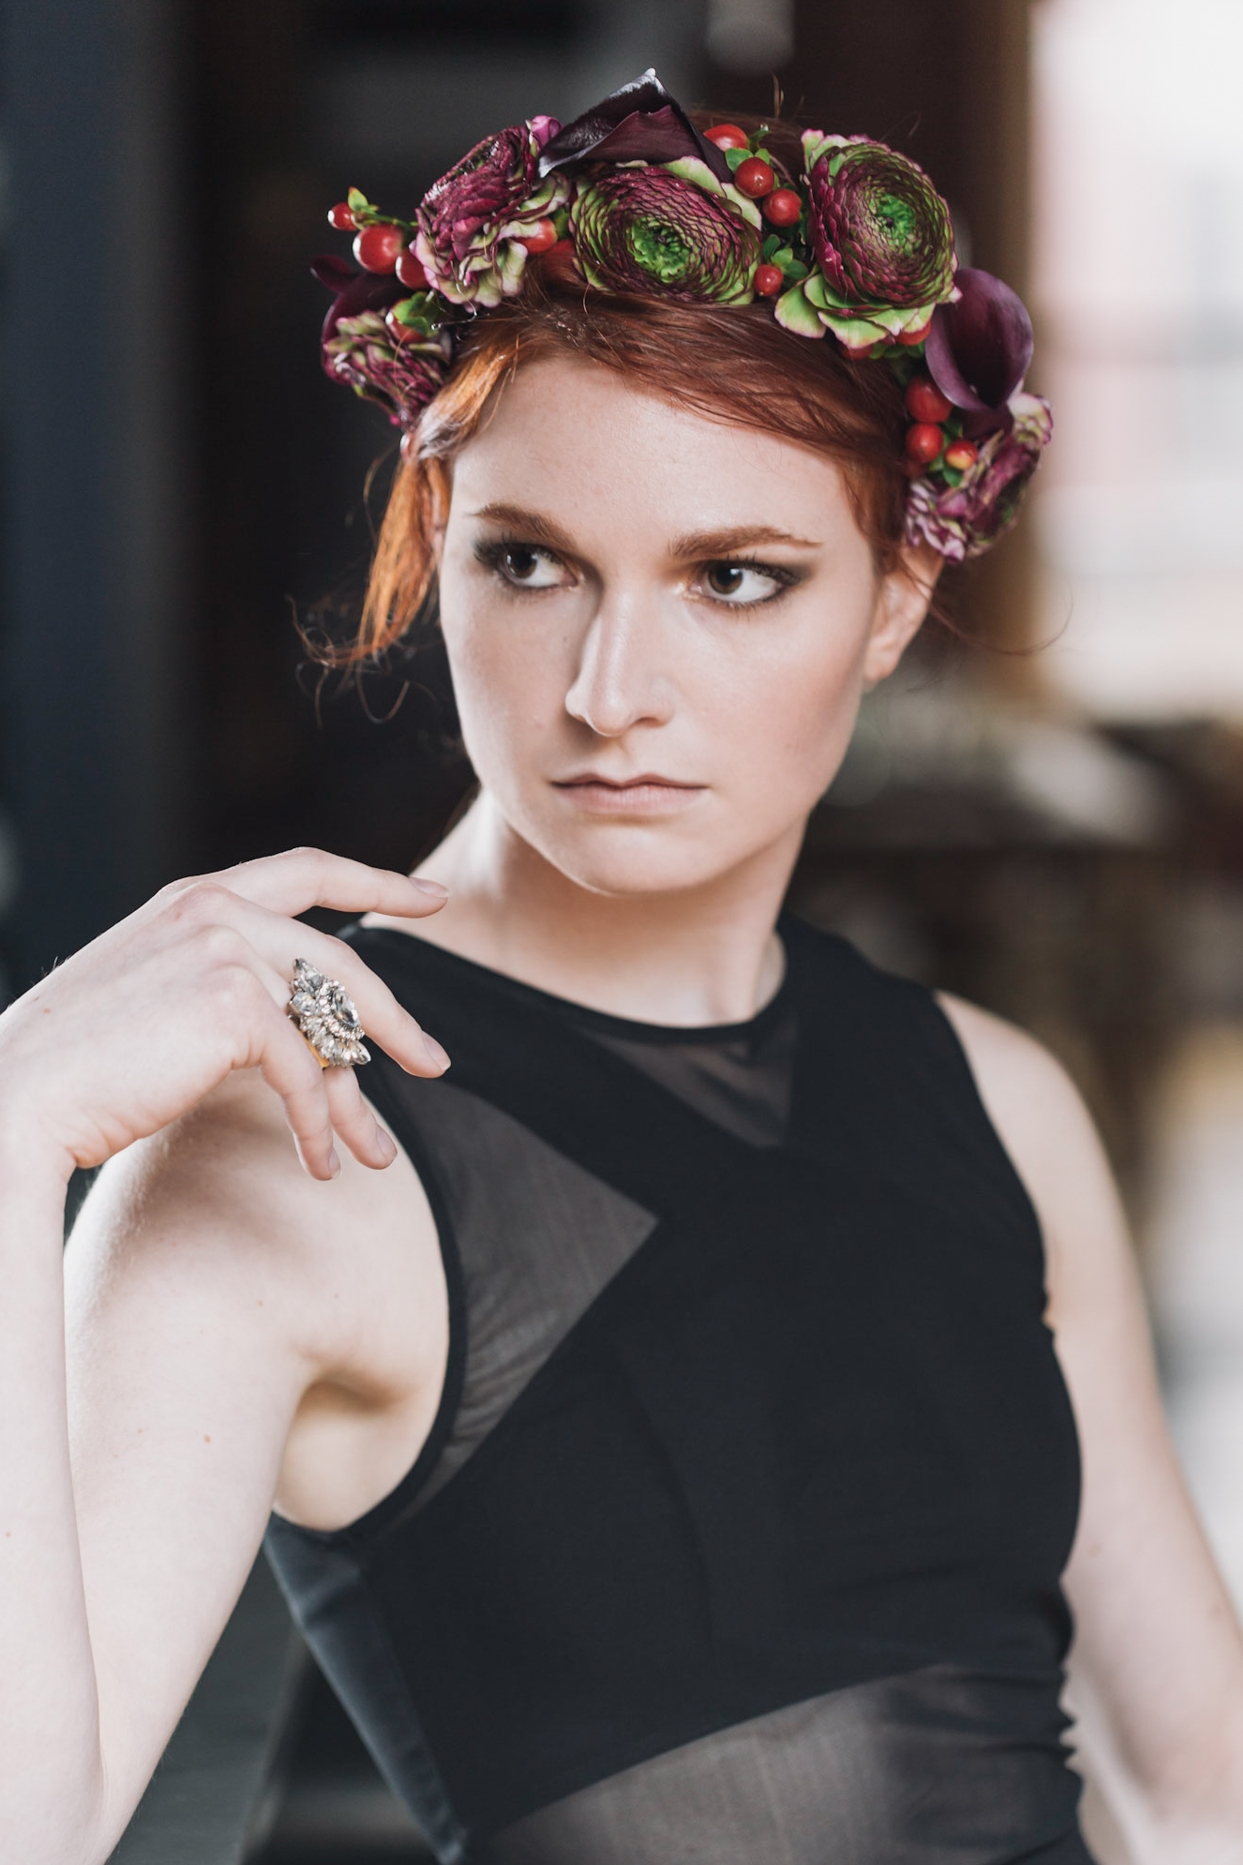 20150320-008-floral_crown_fashion_editorial.jpg